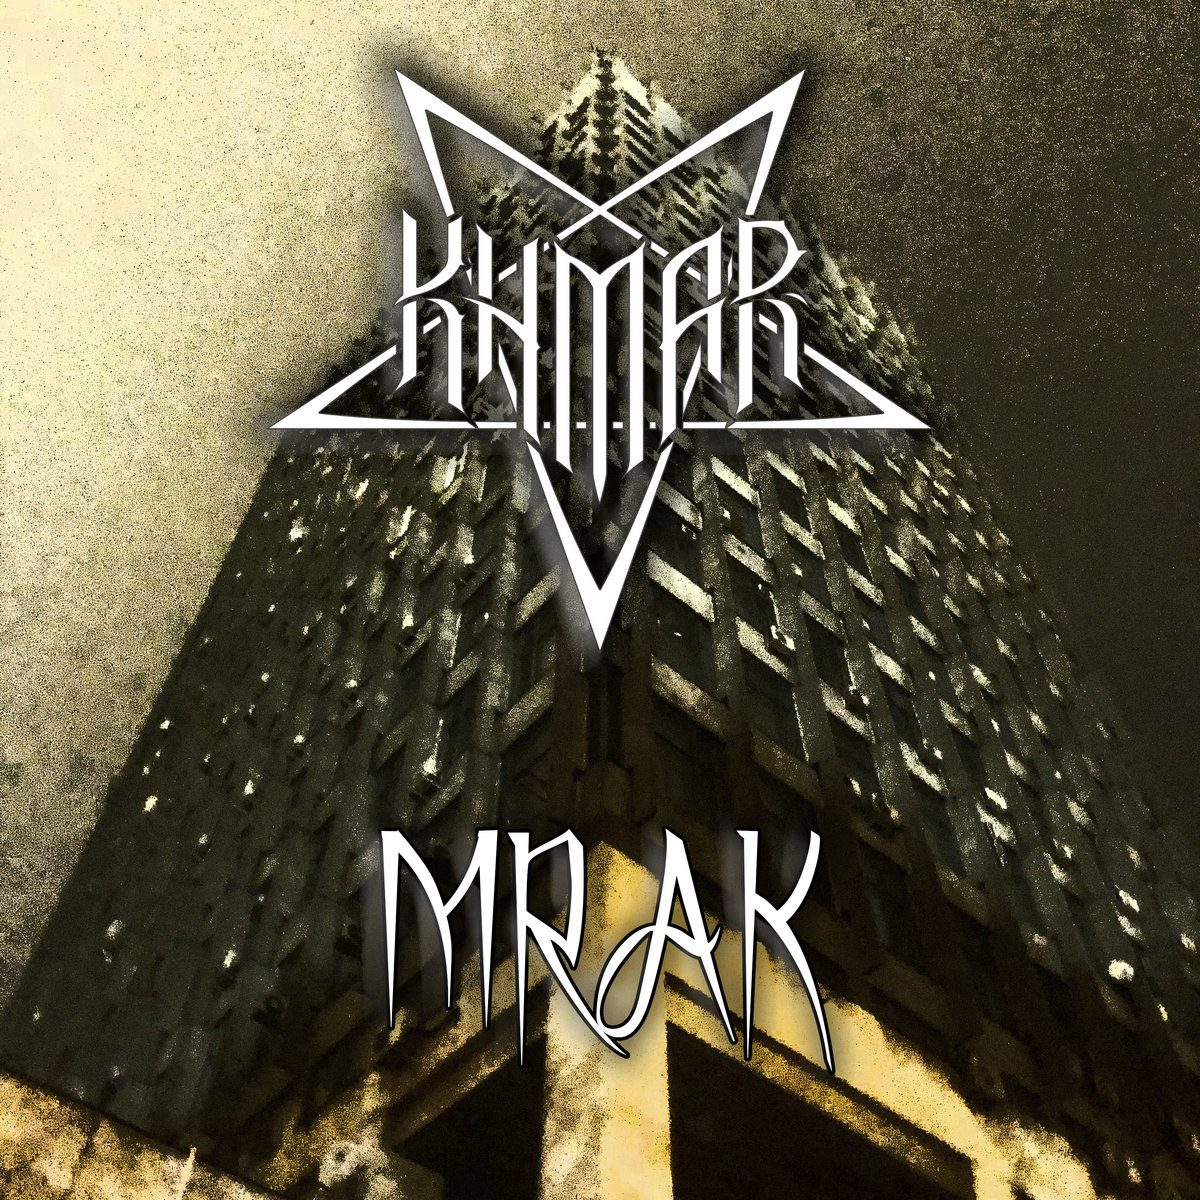 KHMAR debutes on Insane Records with 'Mrak' EP